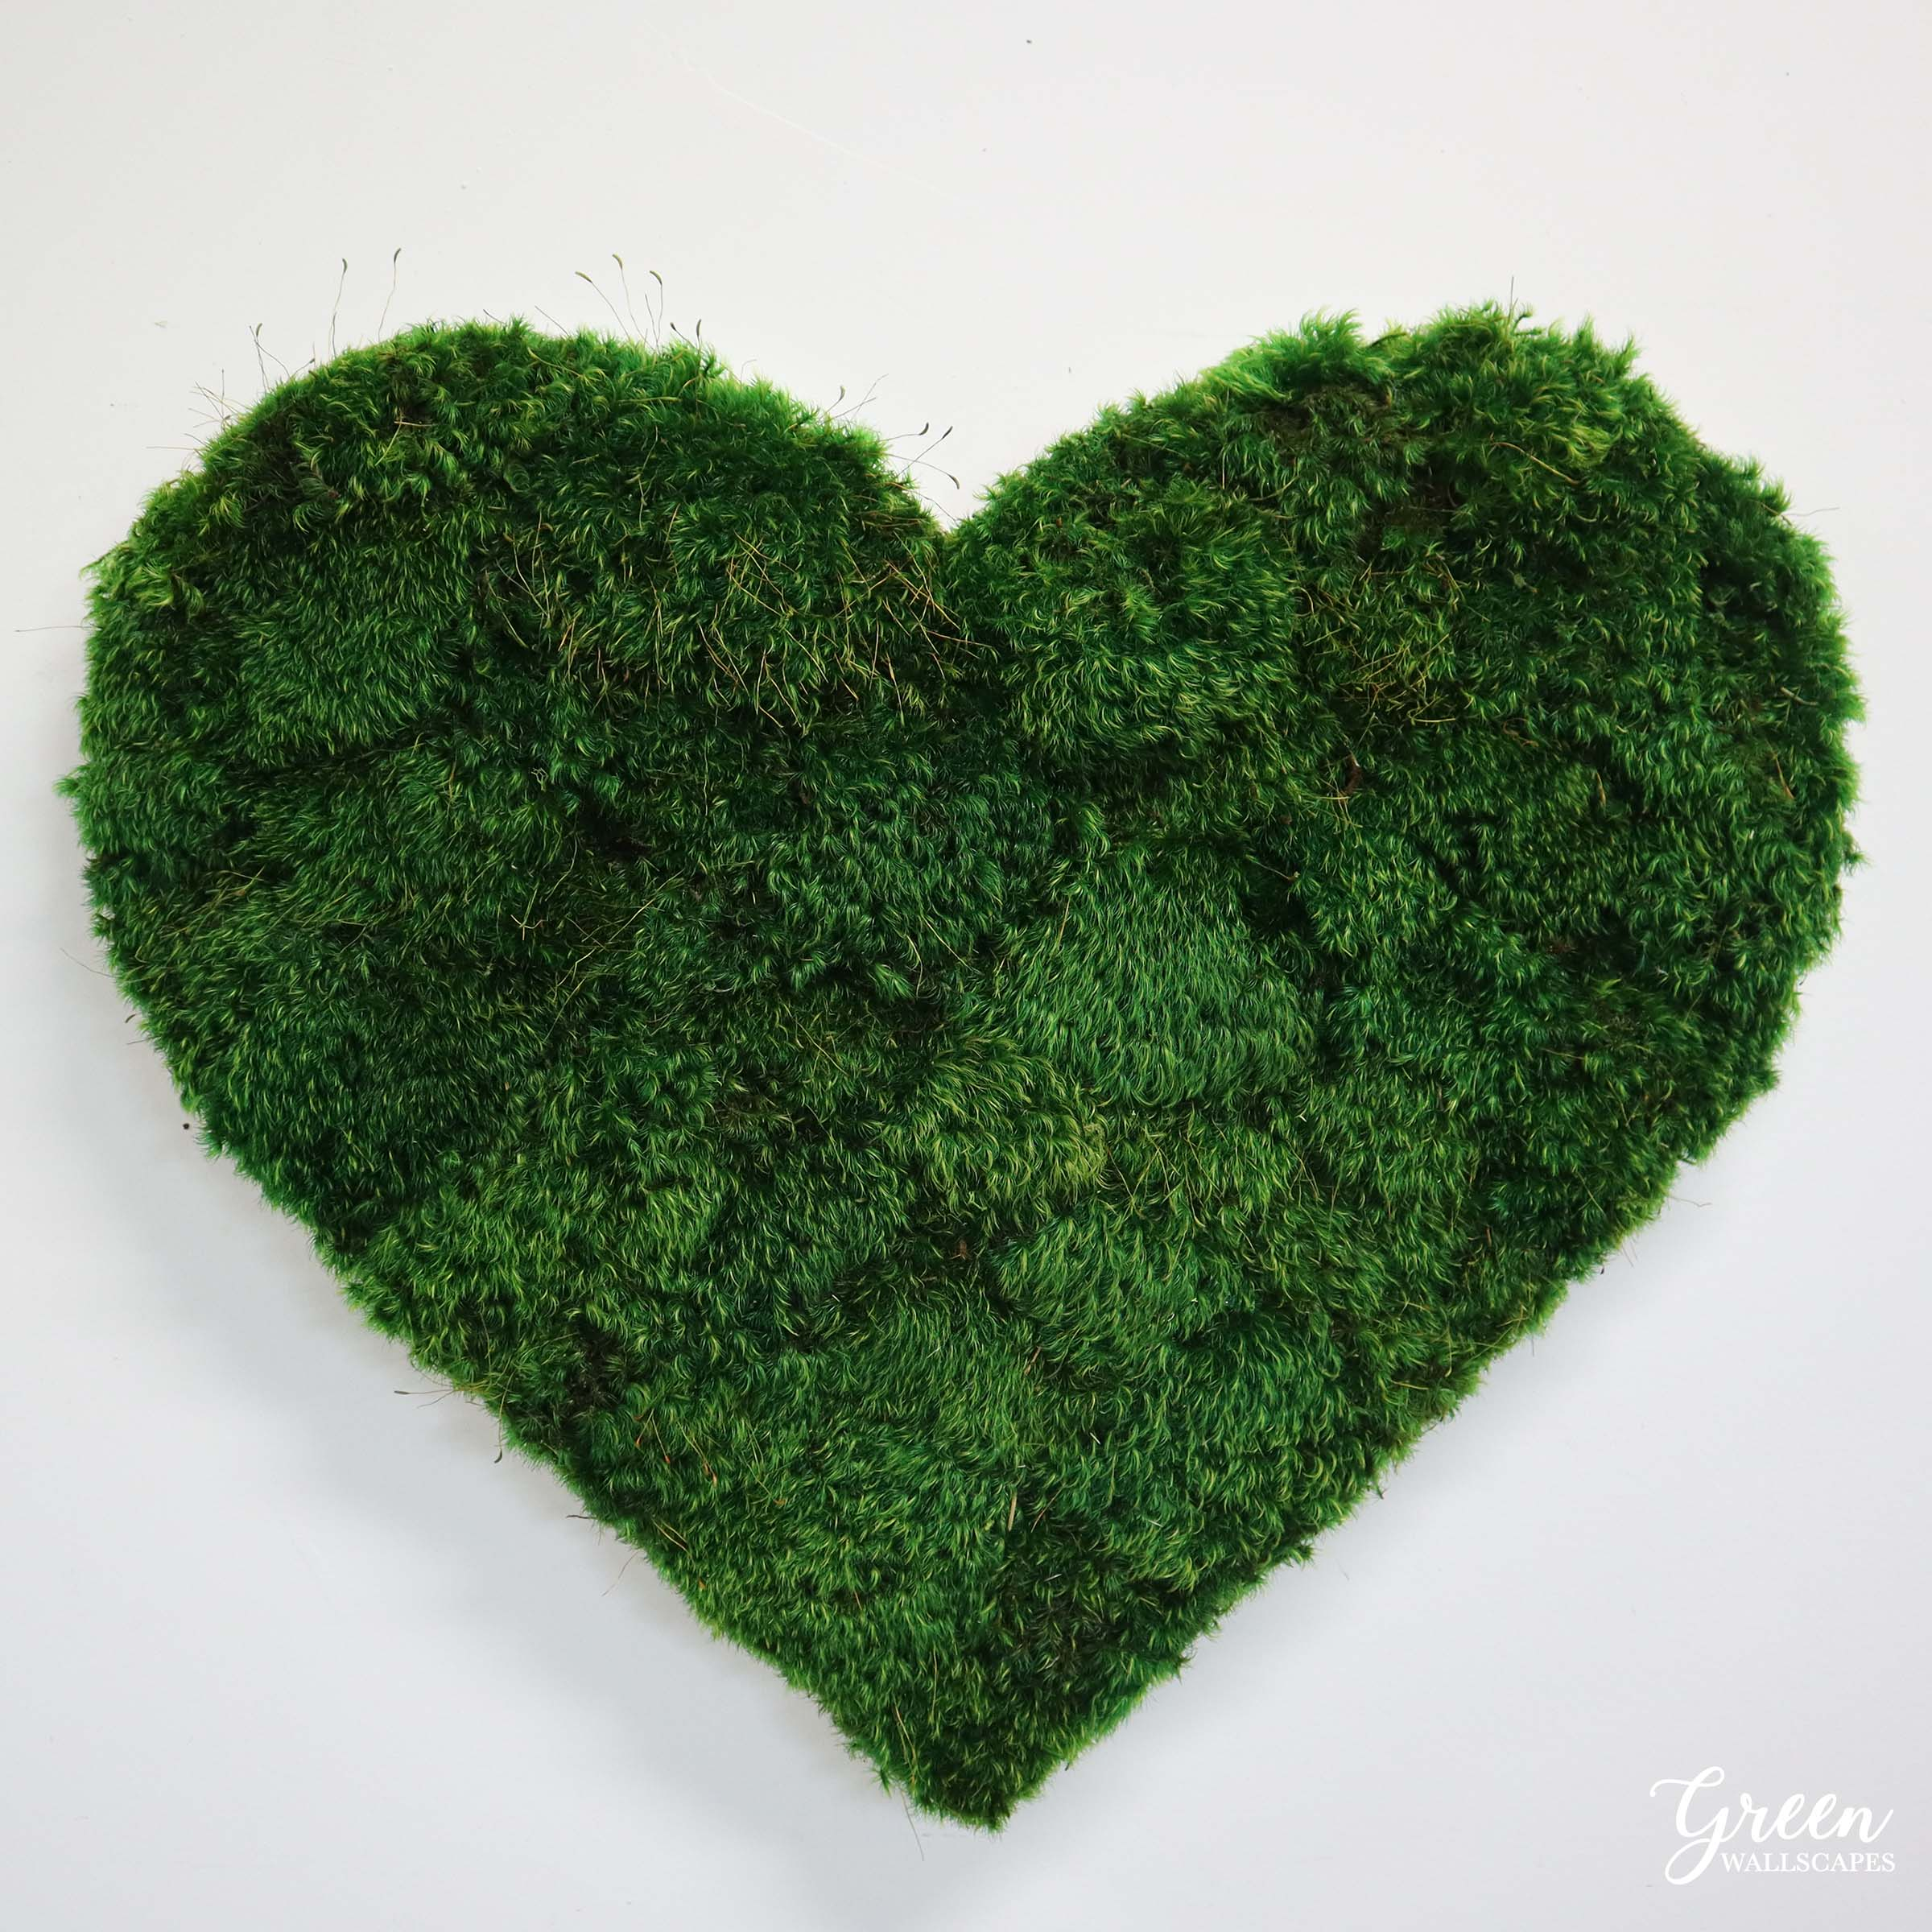 mood_moss_heart_photo_2.jpg